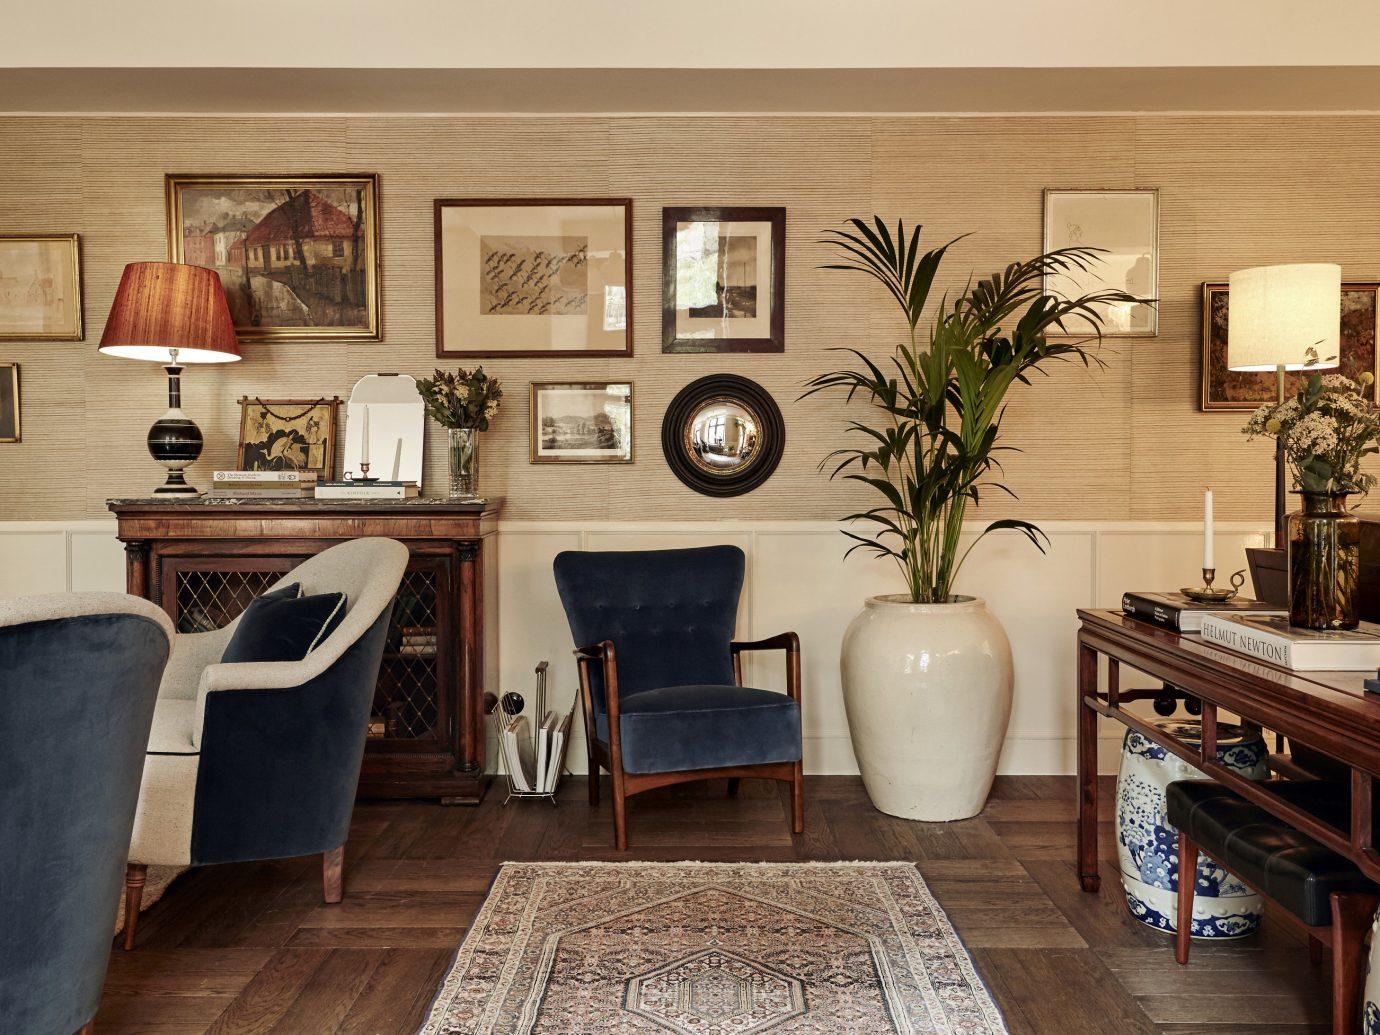 Boutique Hotels Copenhagen Denmark Design Hotels Trip Ideas floor indoor wall Living room living room furniture interior design dining room home table flooring chair hardwood interior designer